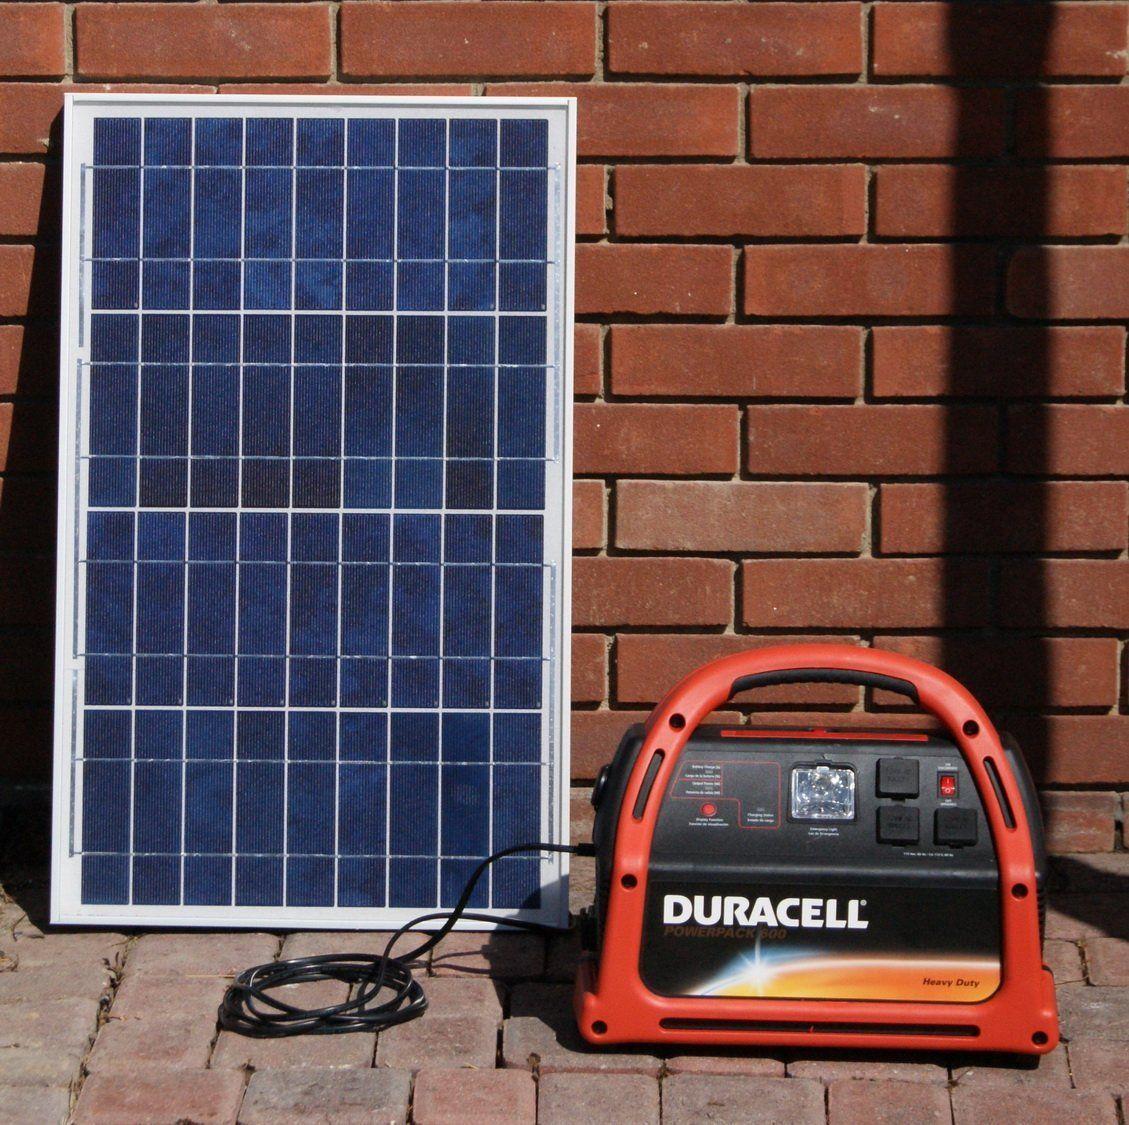 Solar Generator Plug N Play Kit By Offgridsolargenerators Price 399 99 19 49 Shipping 30 Watt 12v Solar Power Kits Portable Solar Power Solar Panels